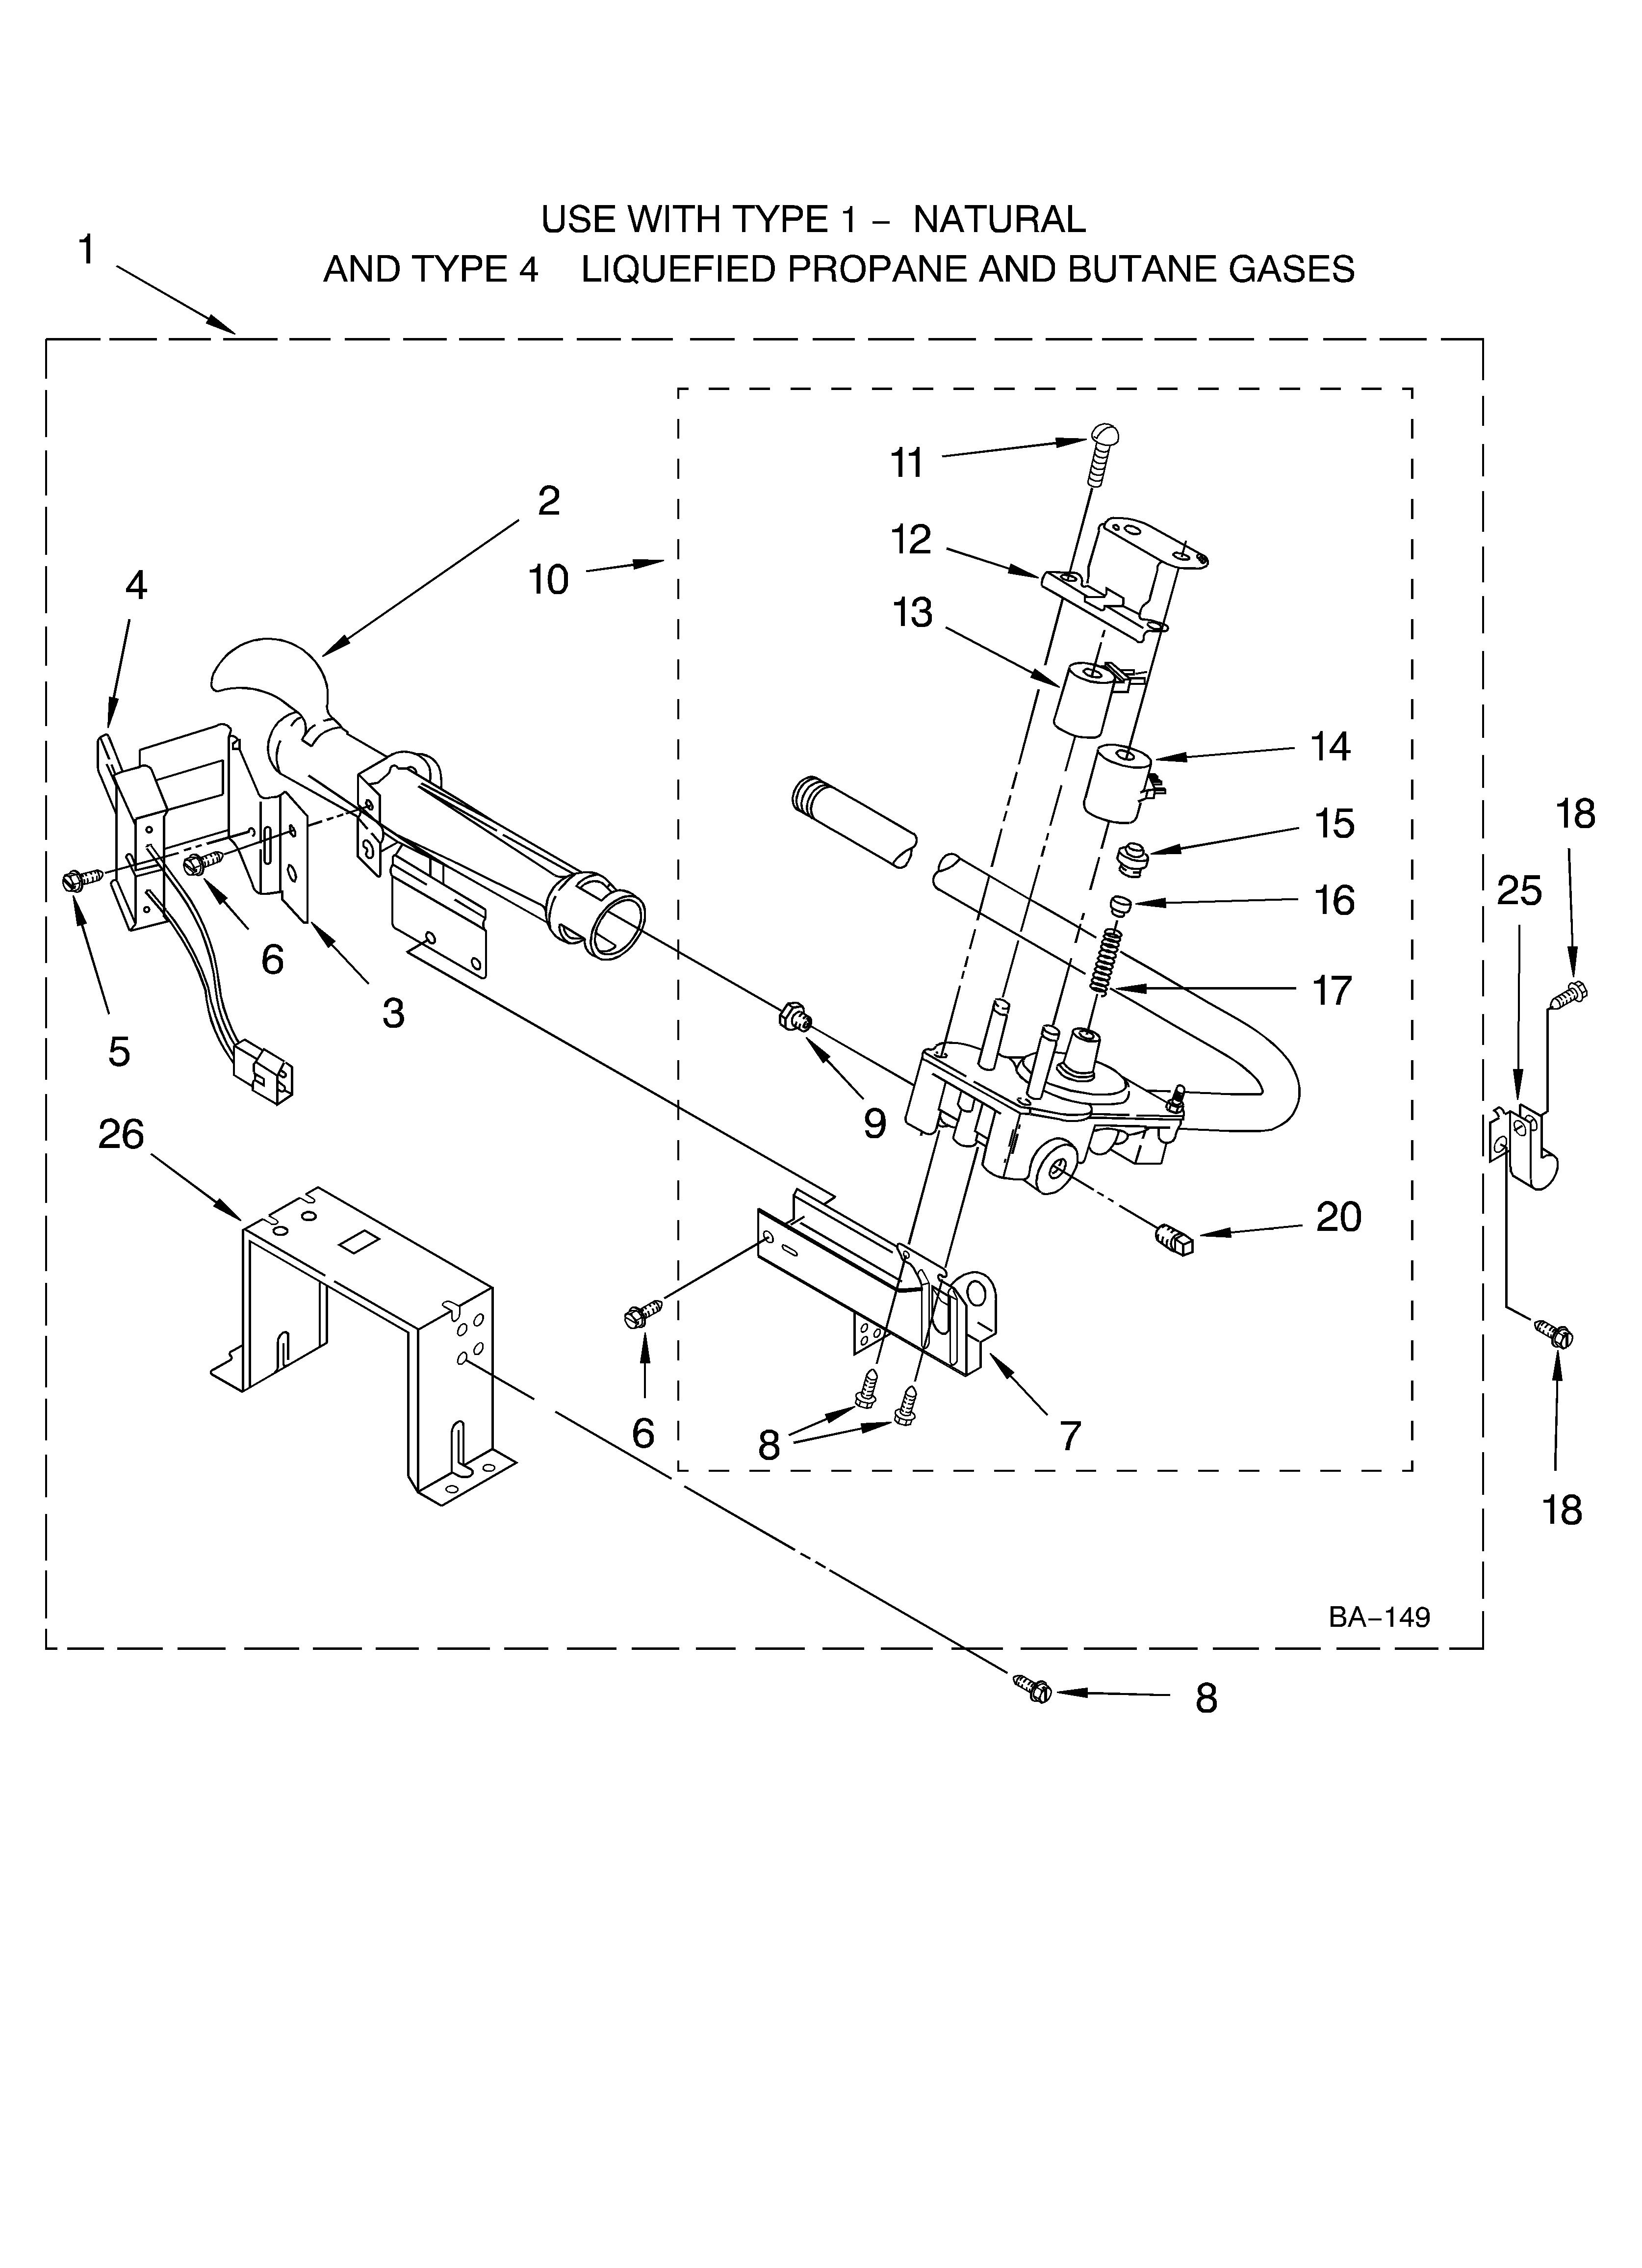 whirlpool dryer schematic wiring diagram vs 5414  pump waterheatertimer org how to wire t1906  vs 5414  pump waterheatertimer org